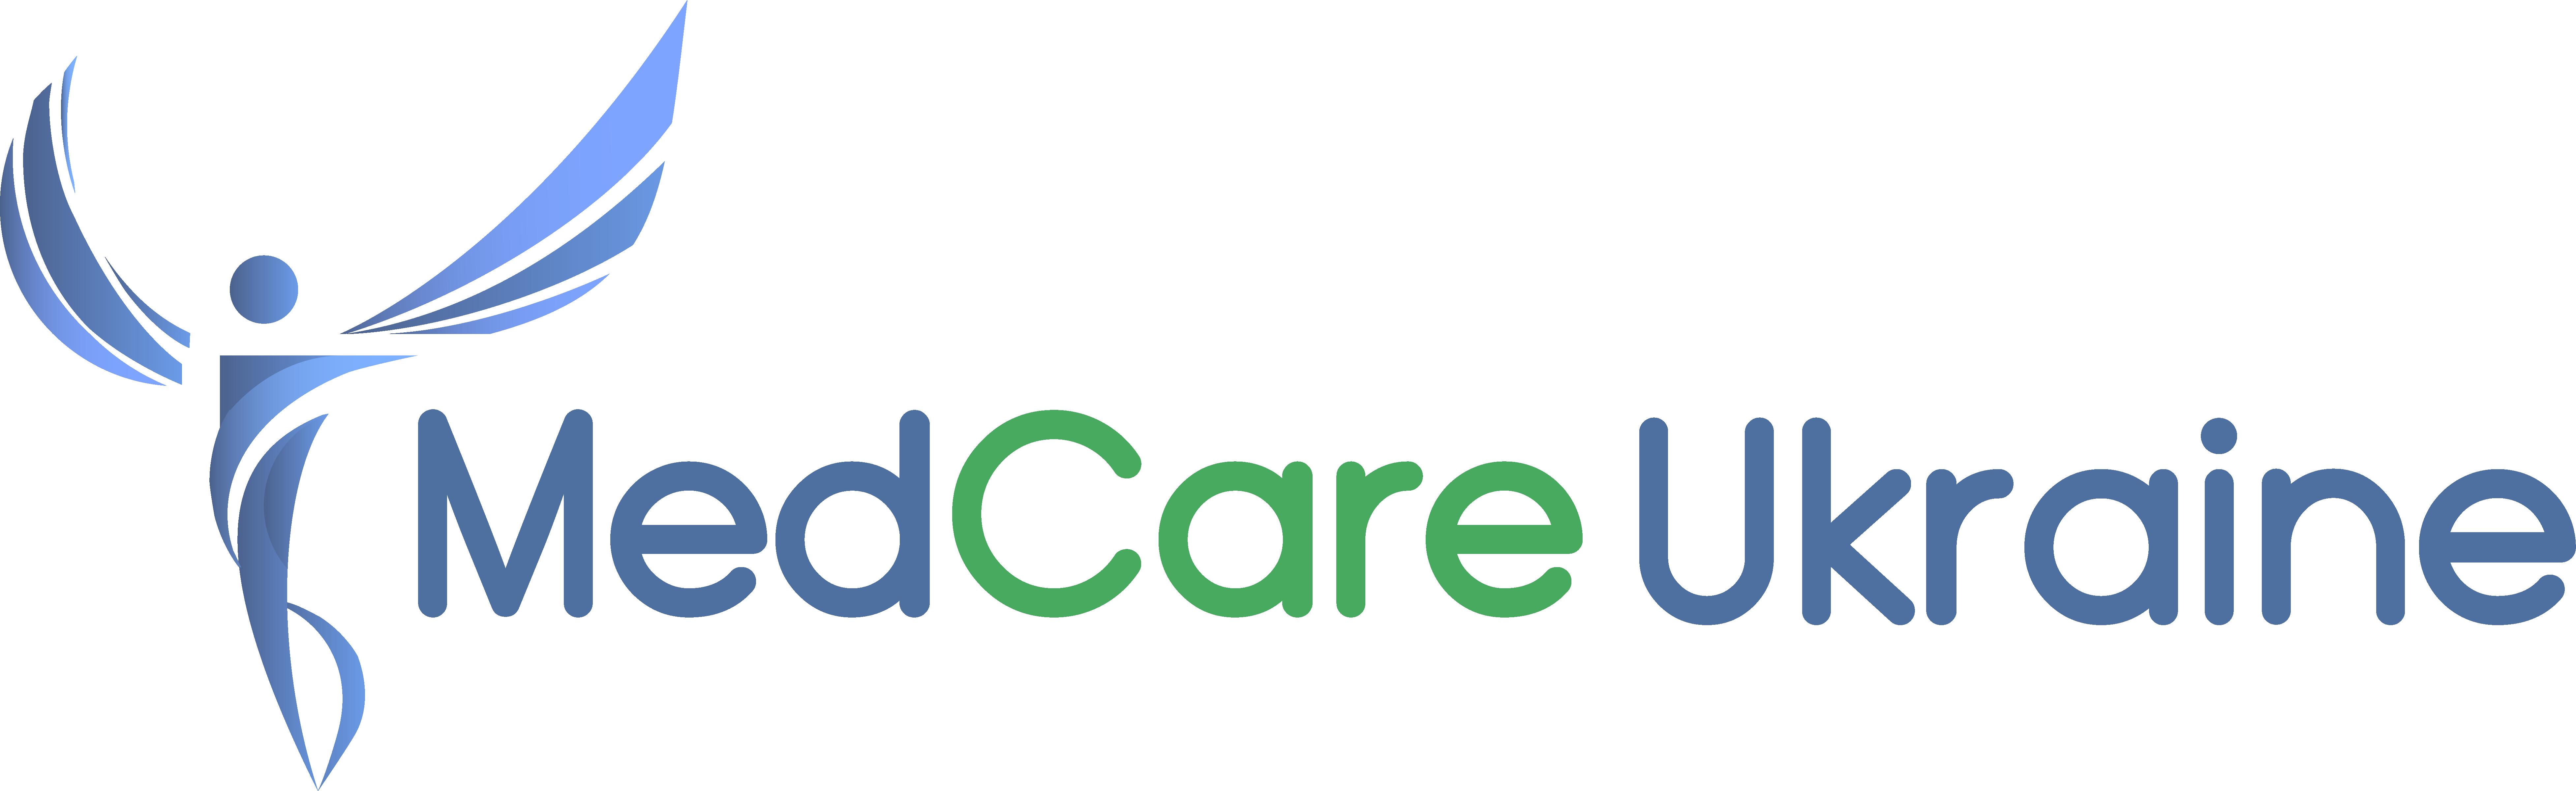 MedCare Ukraine